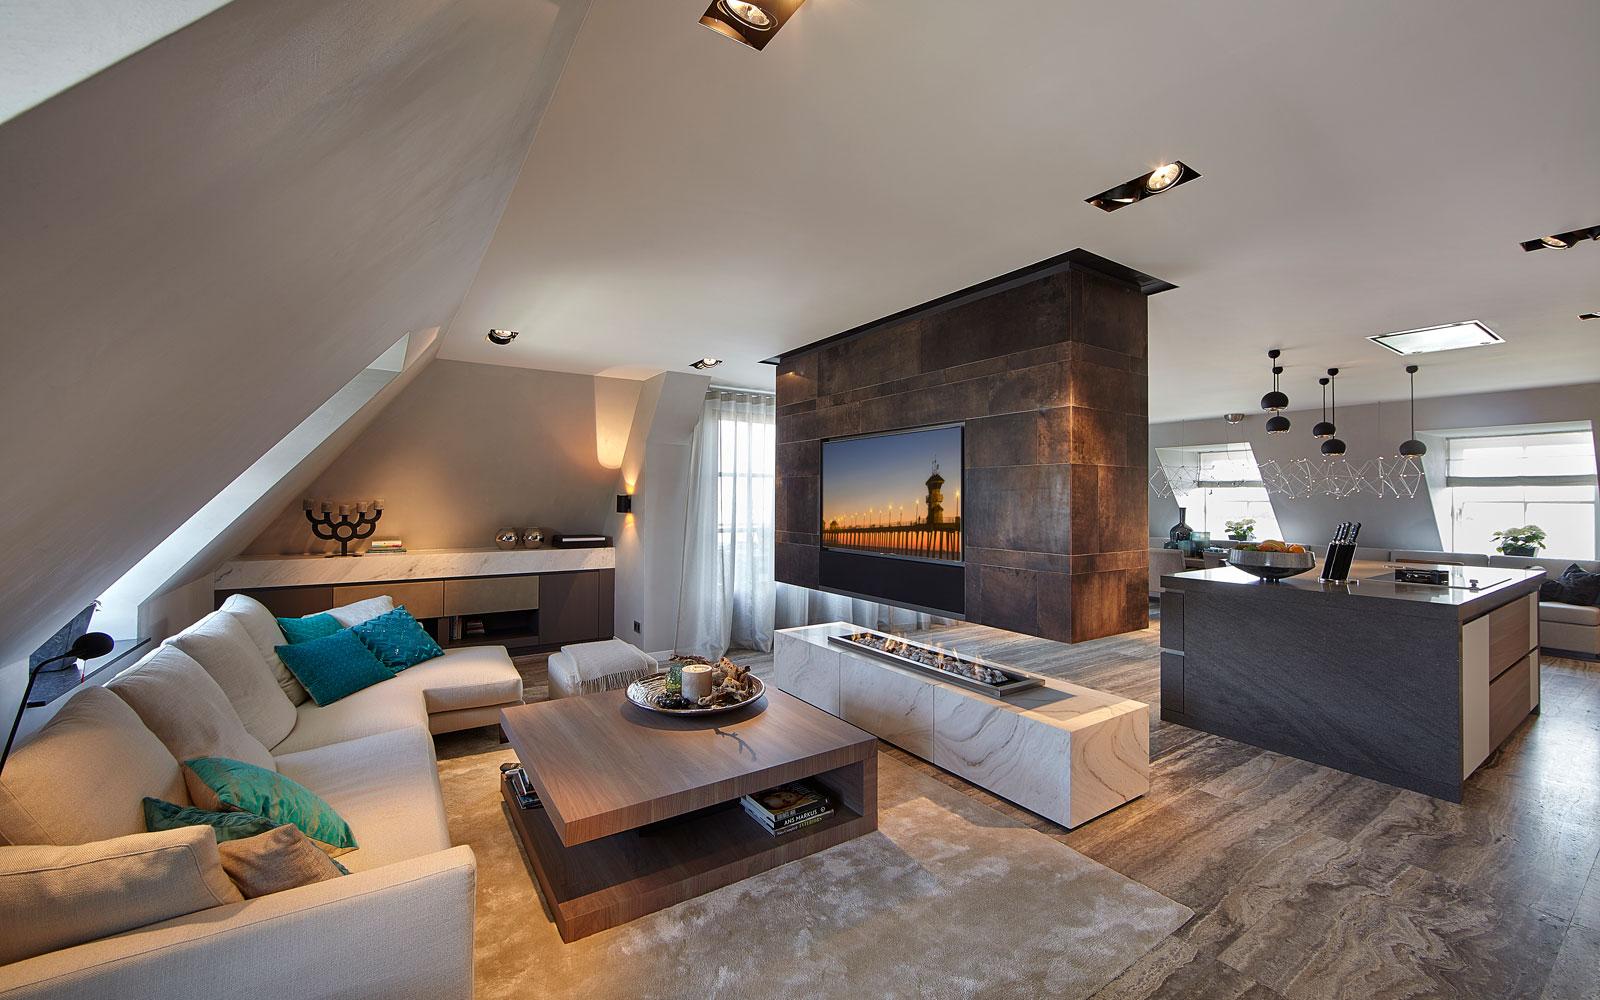 Woonkamer, living, haard, Bad Openhaarden, wandbekleding, Alphenberg Leather, penthouse, Eric Kant